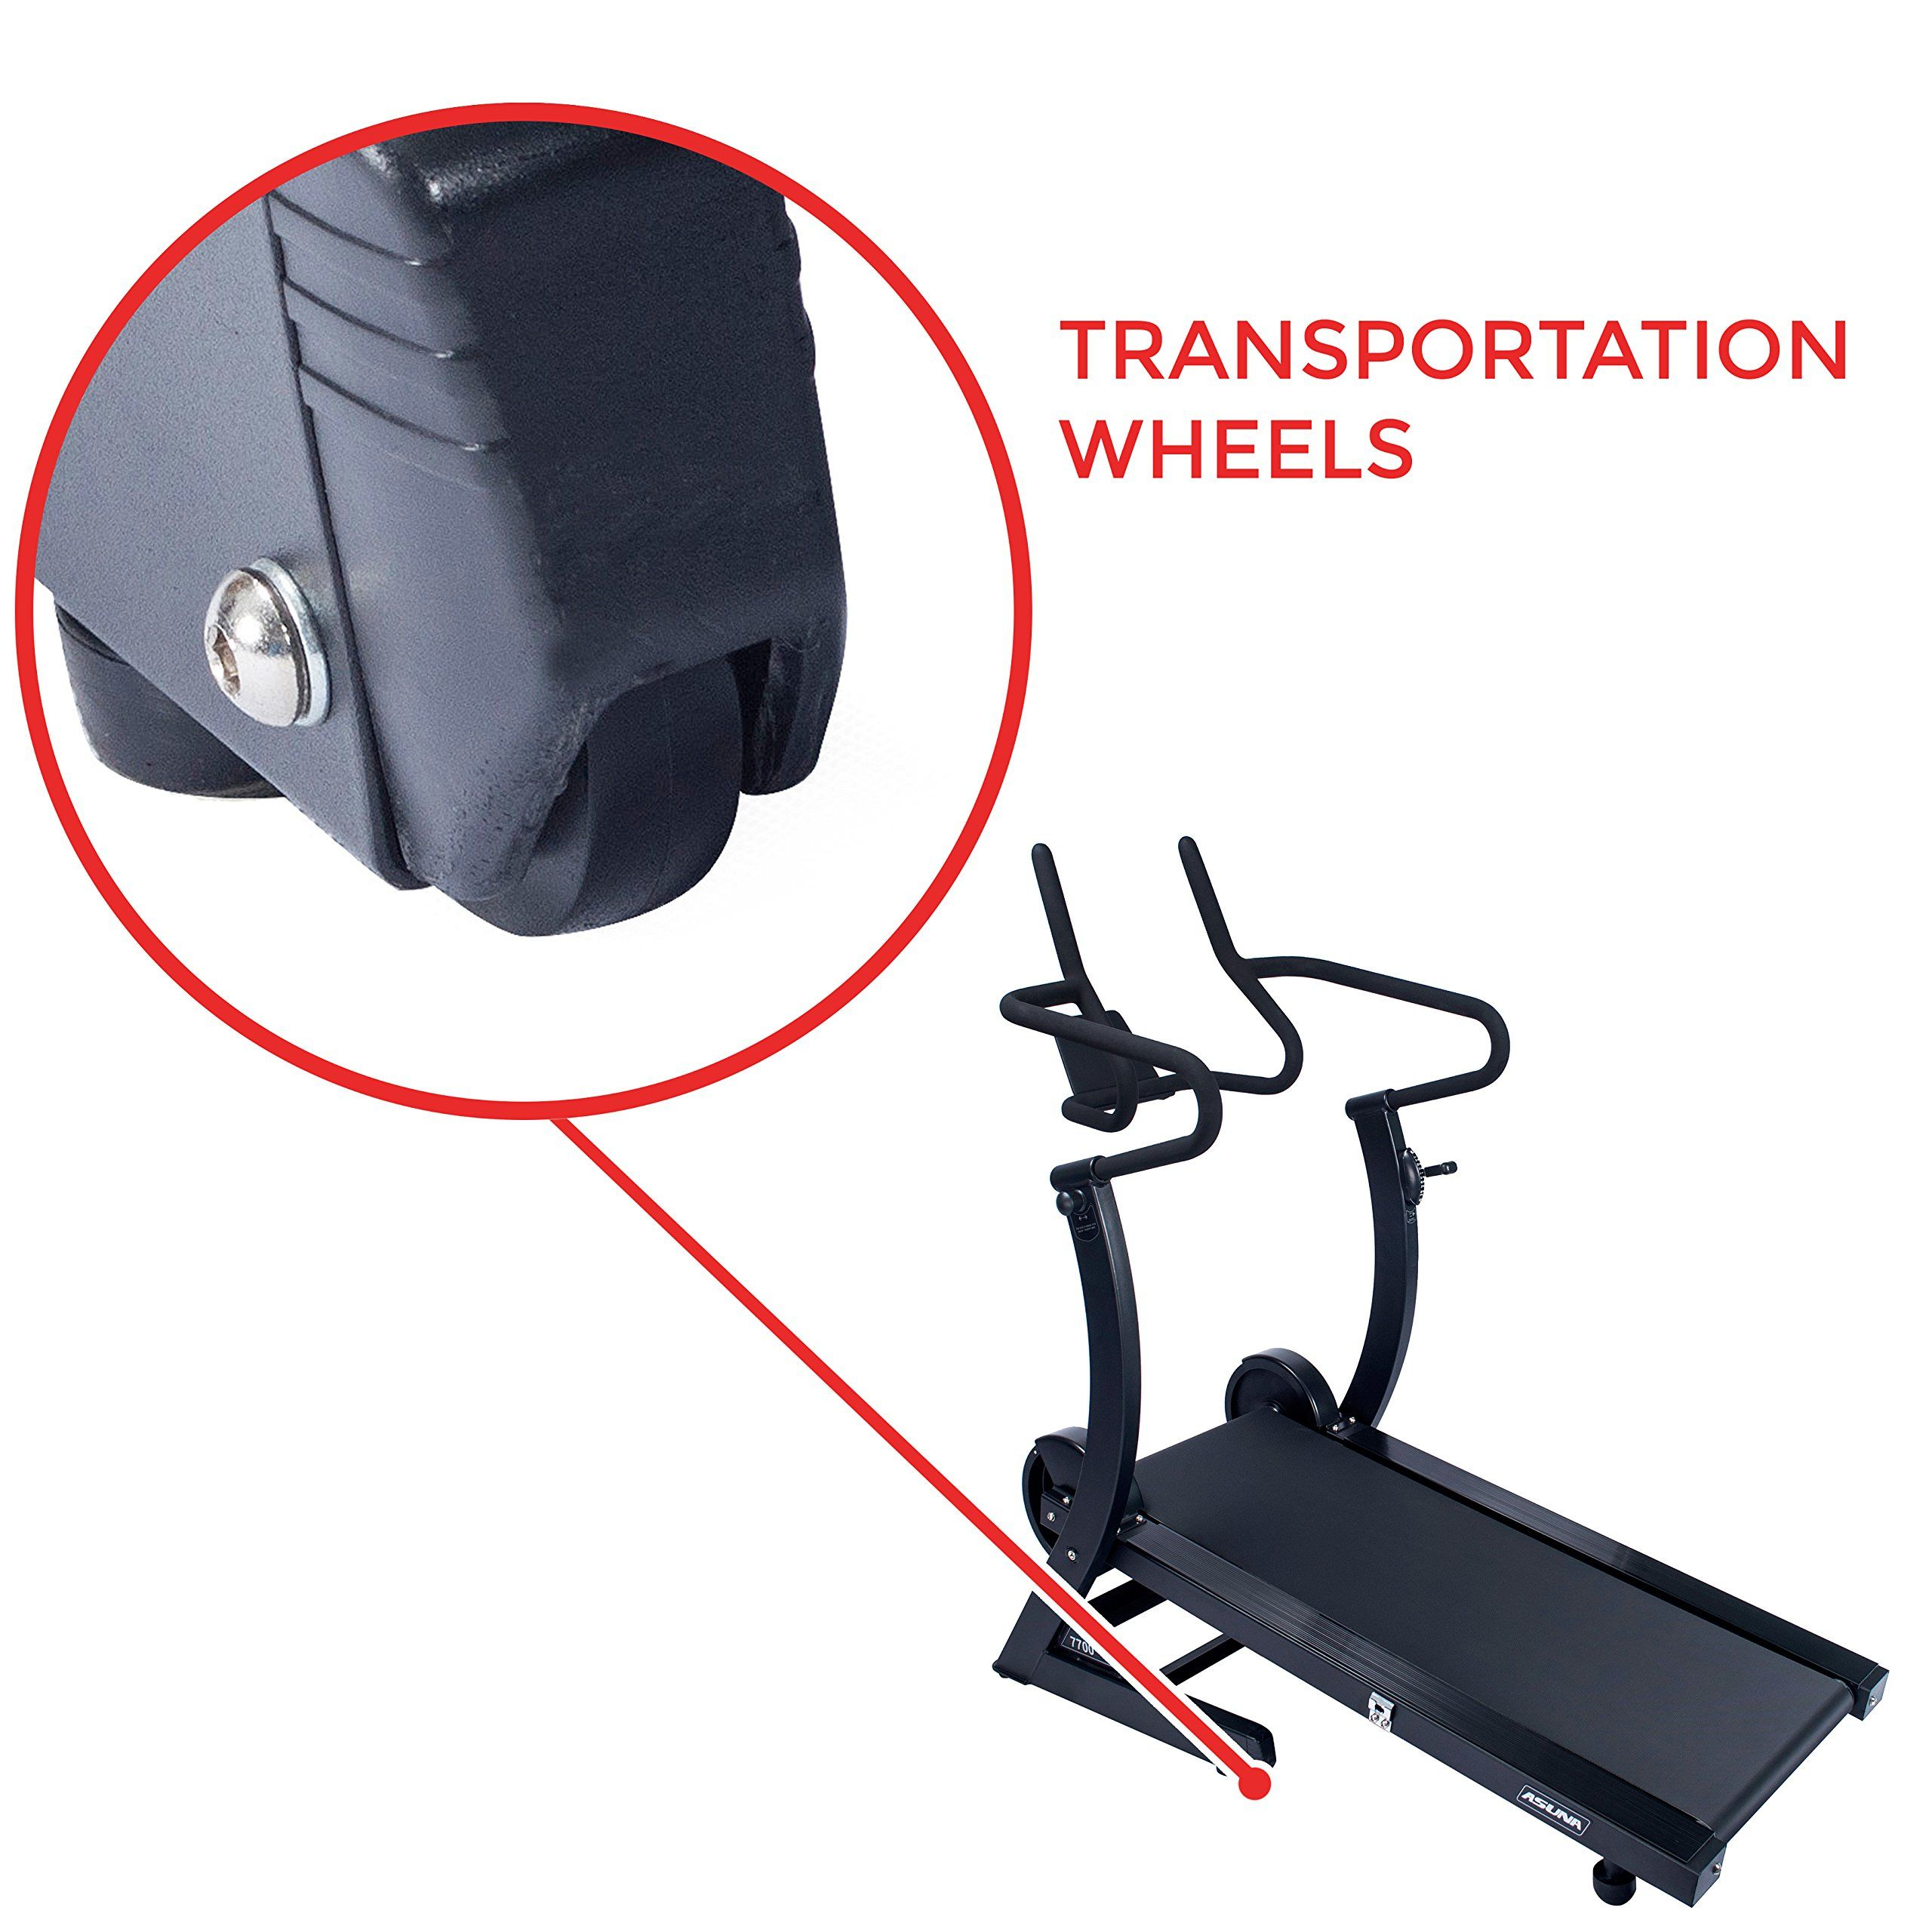 Asuna hiperformance cardio trainer self powered manual